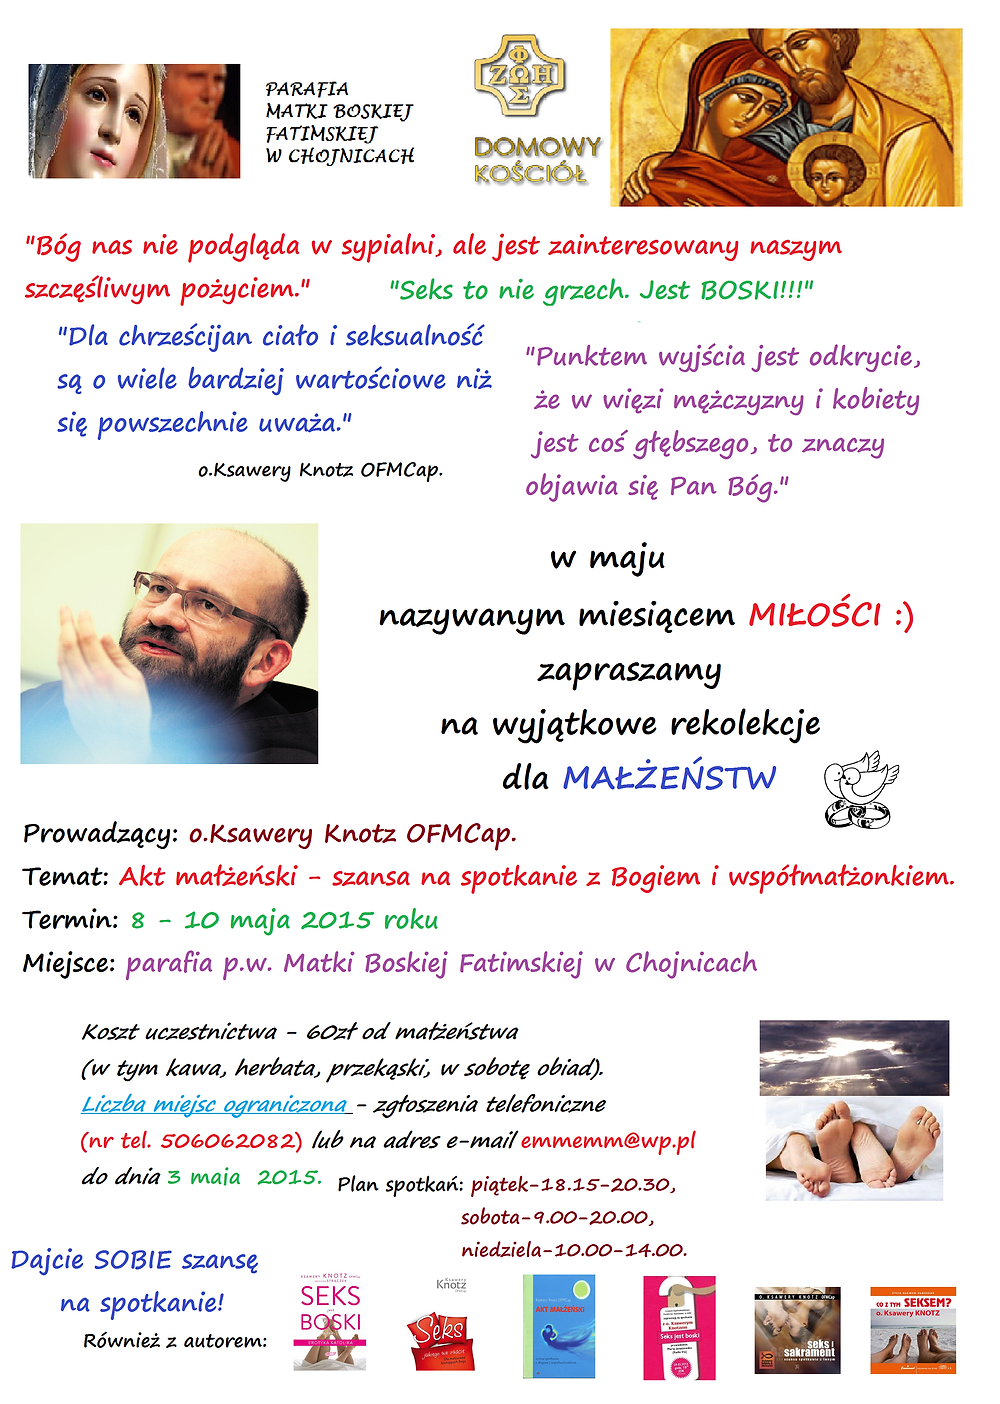 Akt ma--e-ski - rekolekcje z o.Knotzem PLAKAT.png